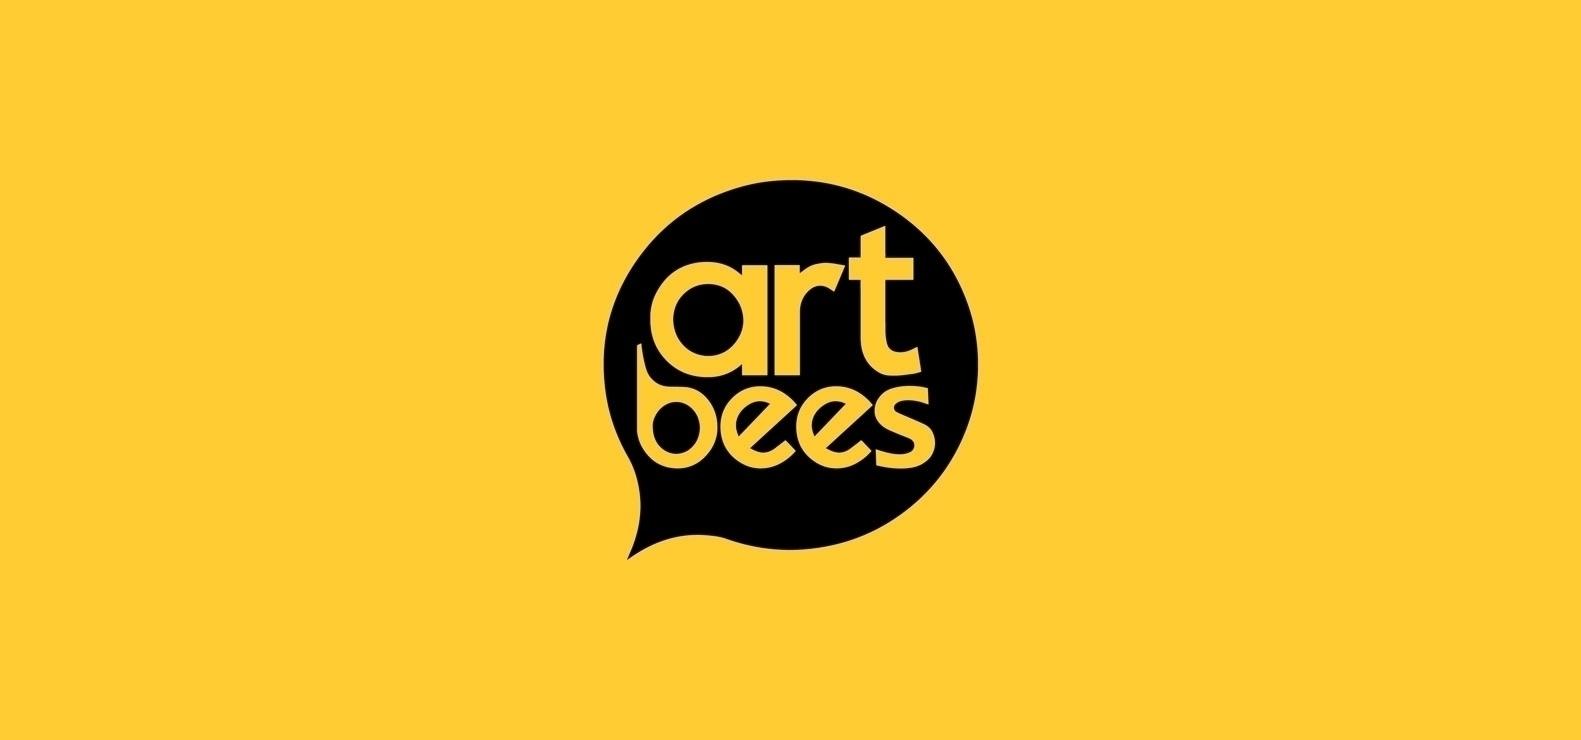 Artbees, Logo, Scotland - artbees | ello